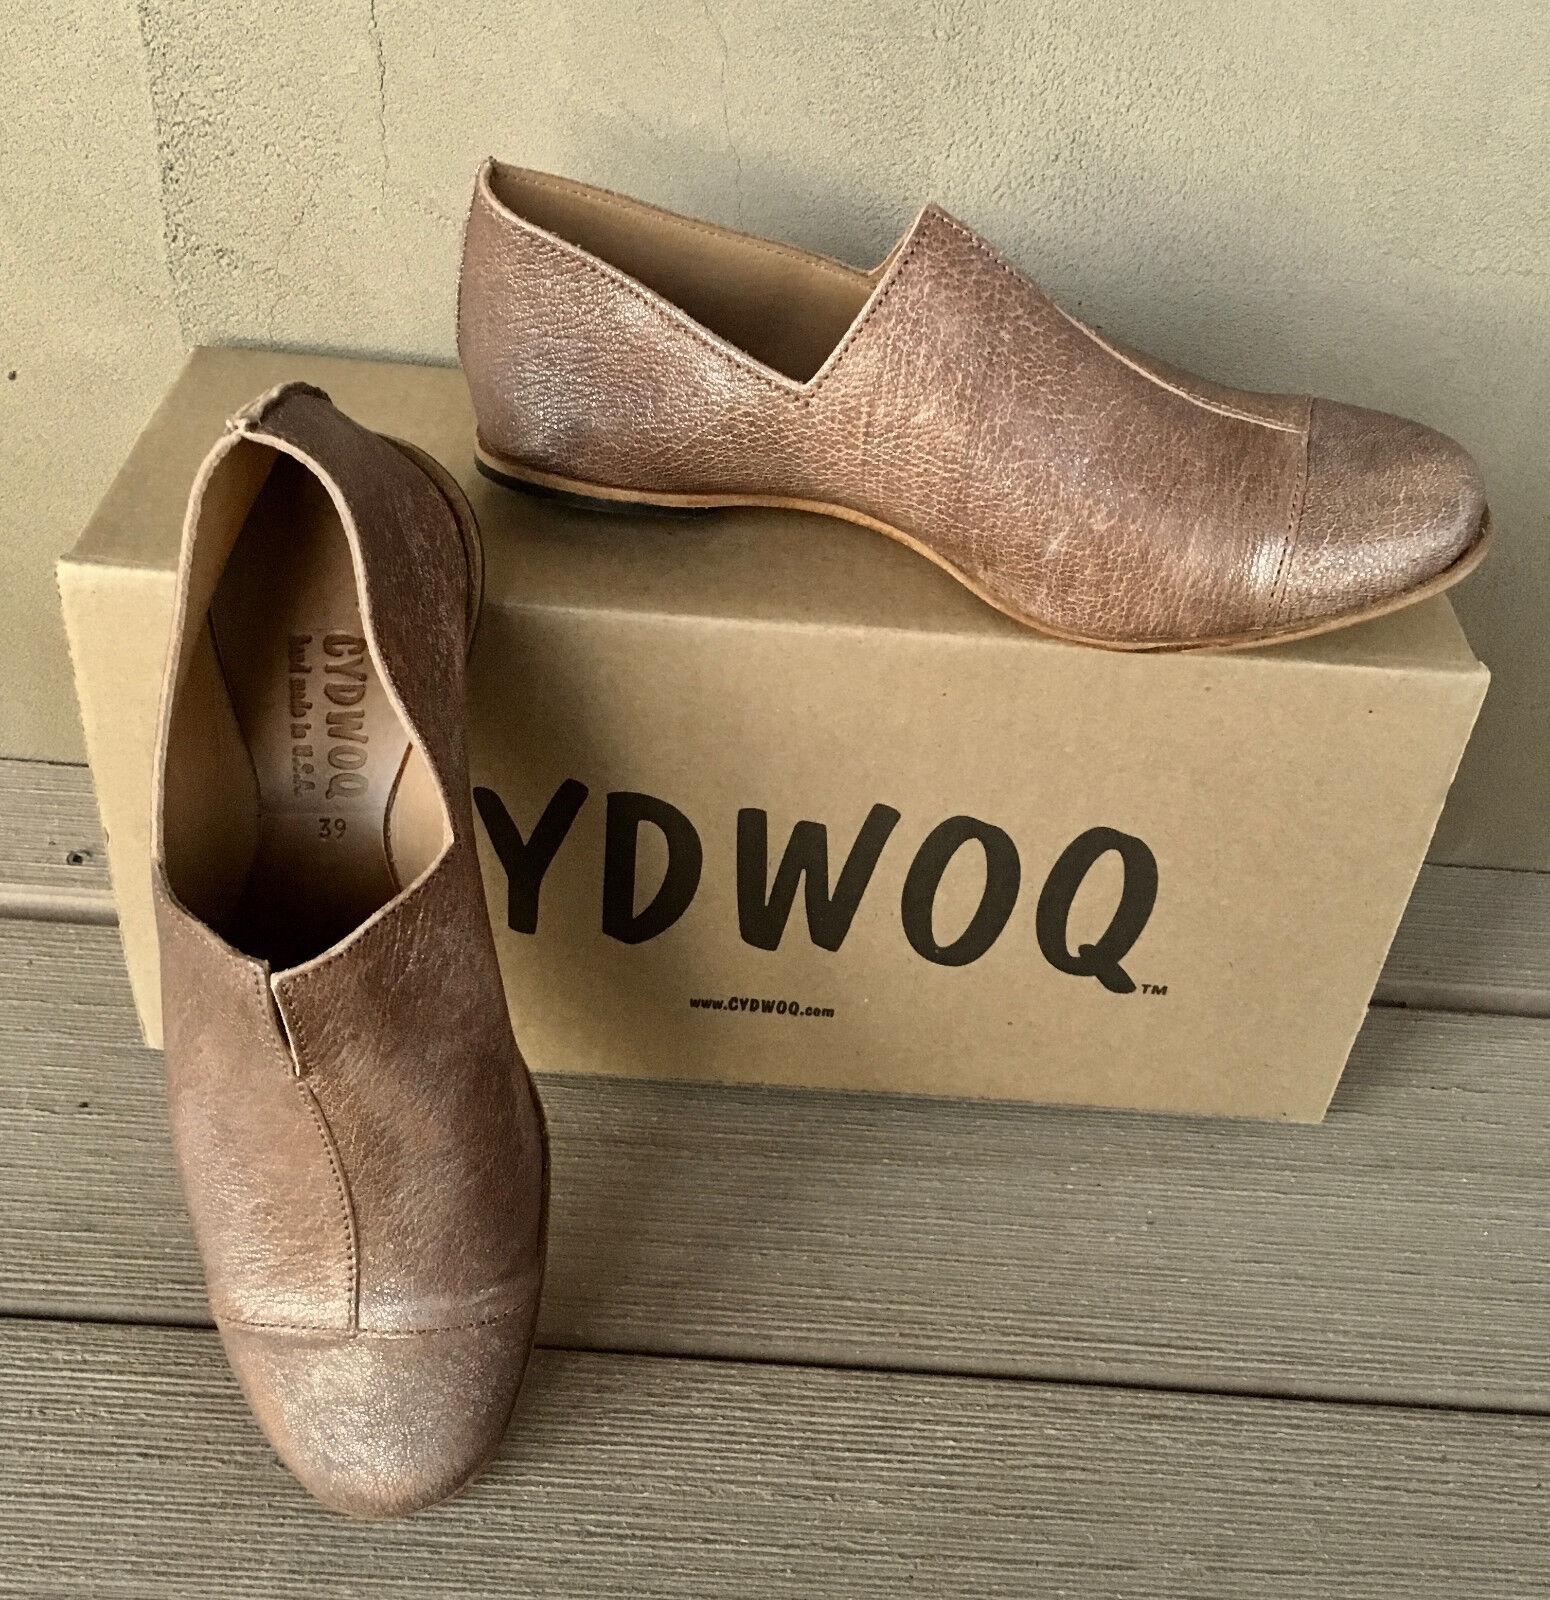 NEW NIB Cydwoq Starlight Medicine Medicine Medicine chaussures 36 6.5 Sundance Catalog slip on   282 64394d